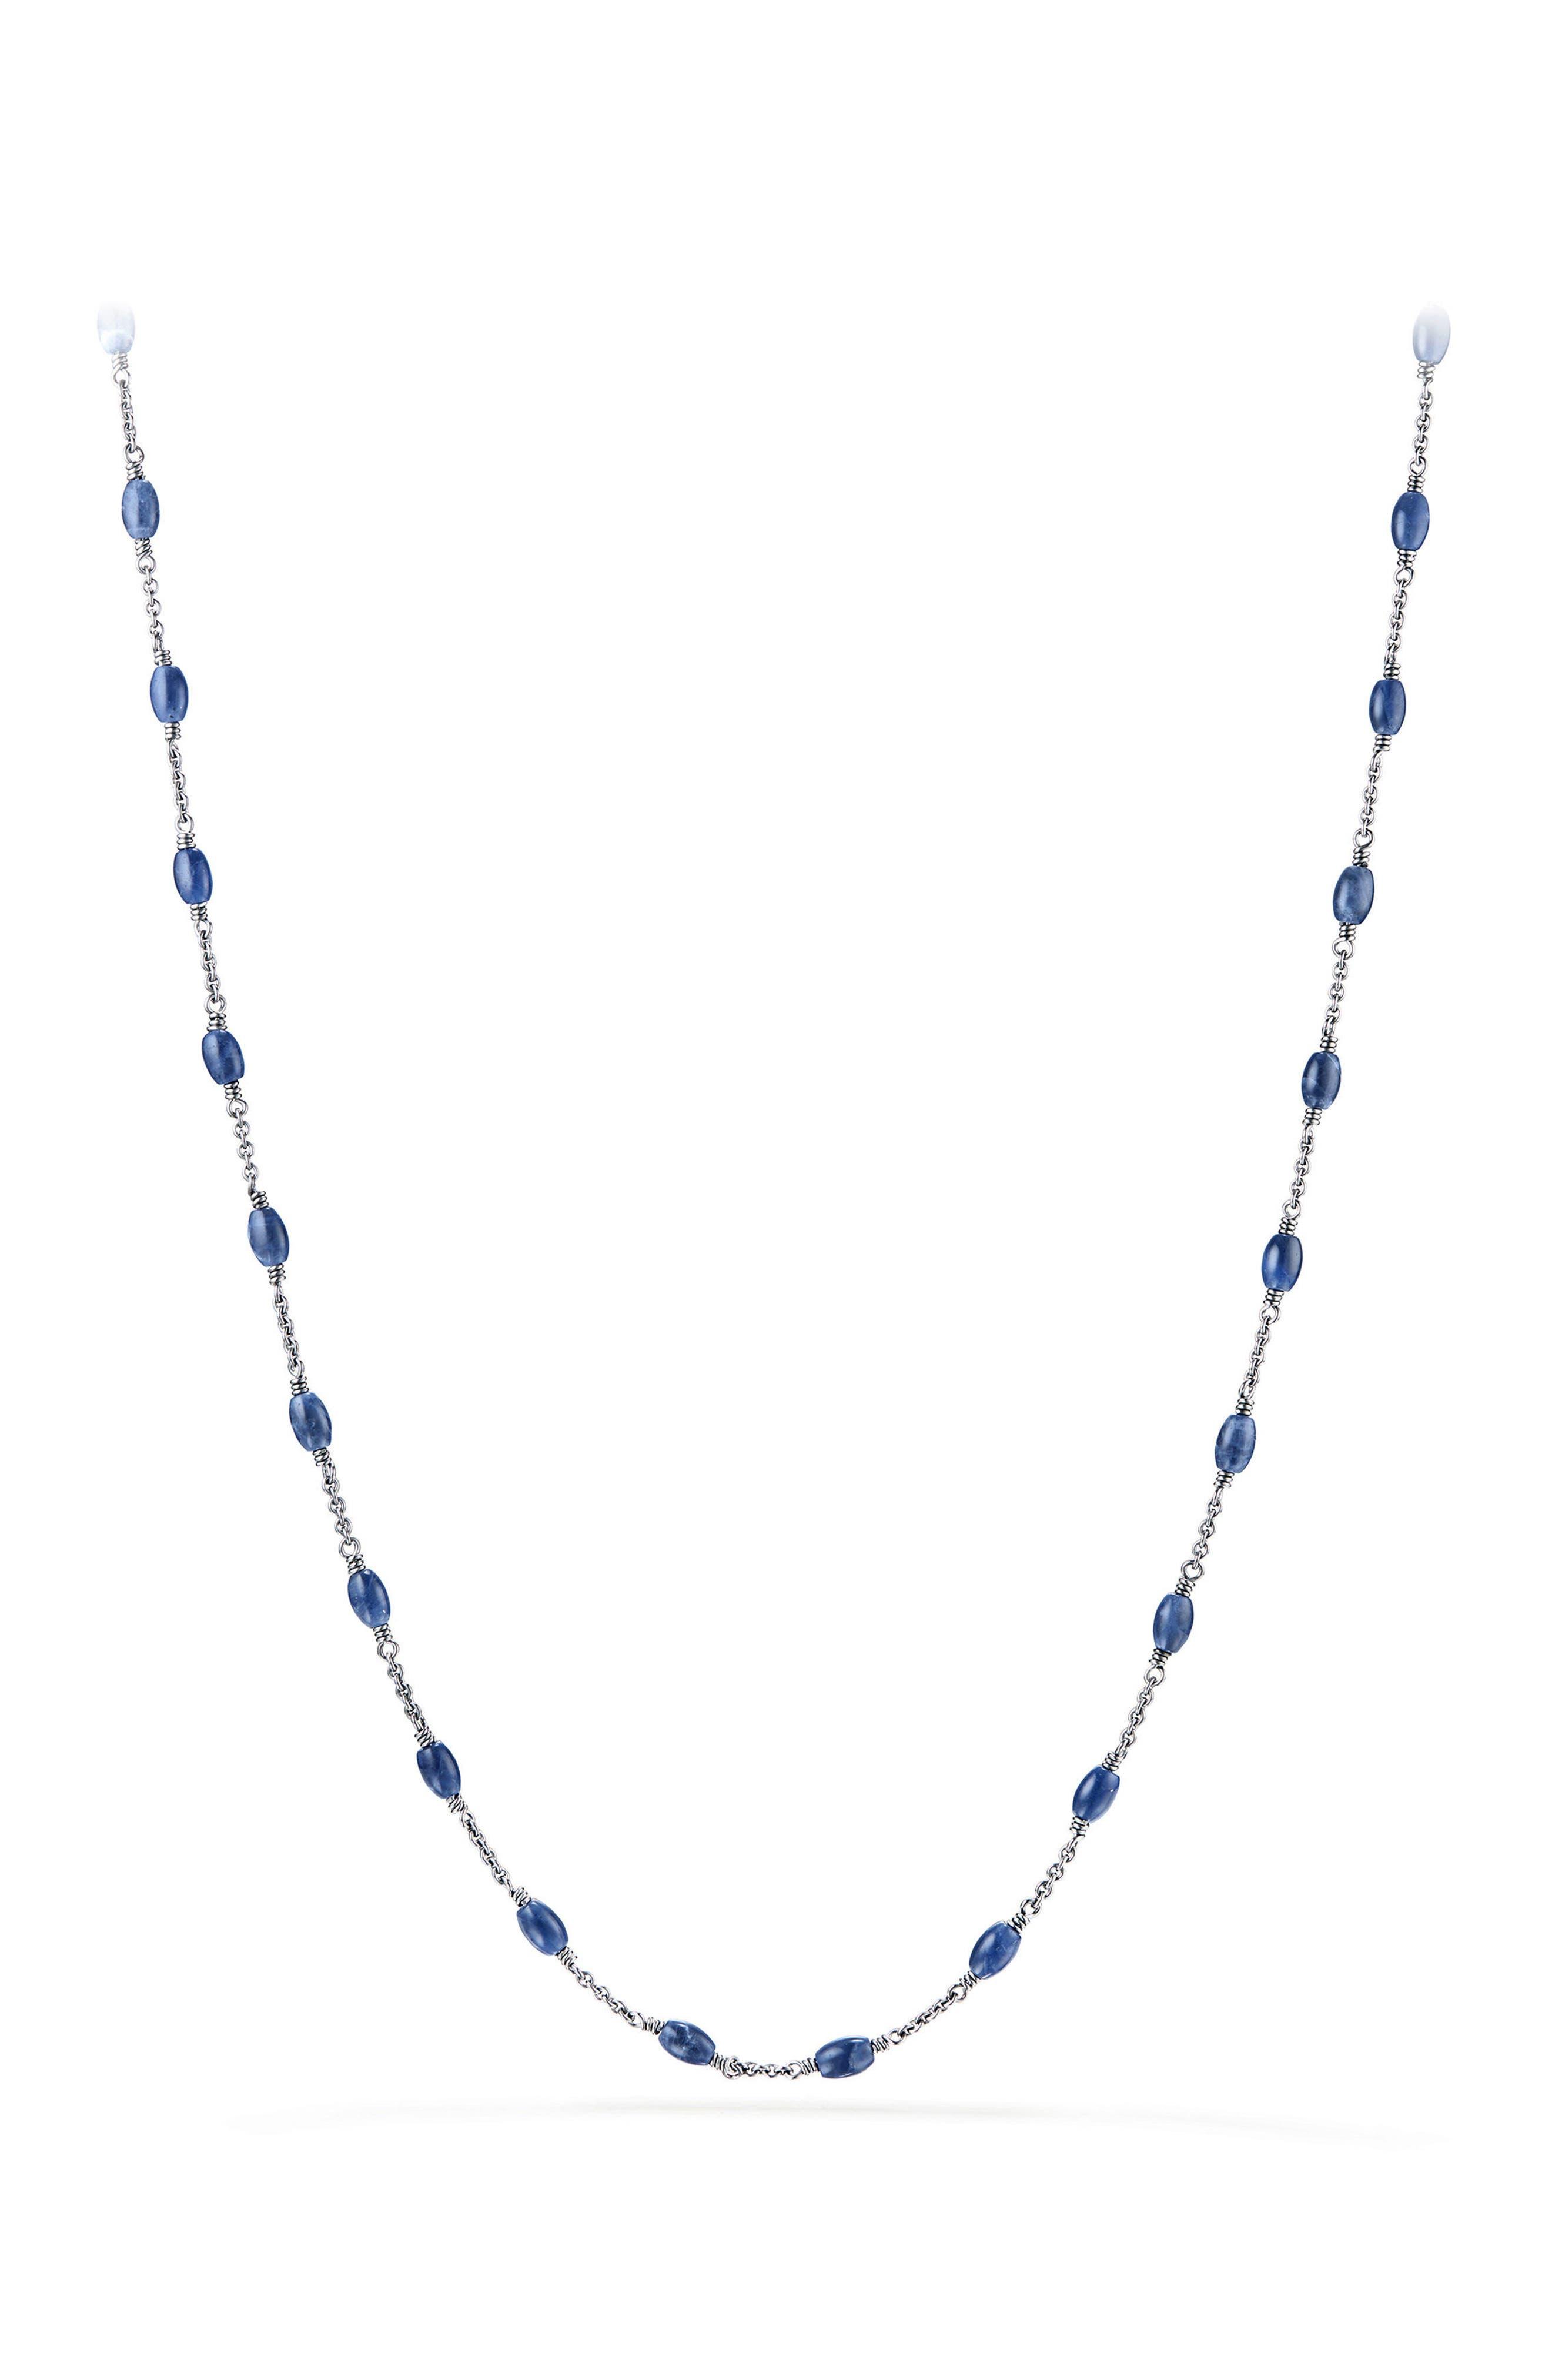 Spiritual Beads Necklace,                             Main thumbnail 1, color,                             Sodalite